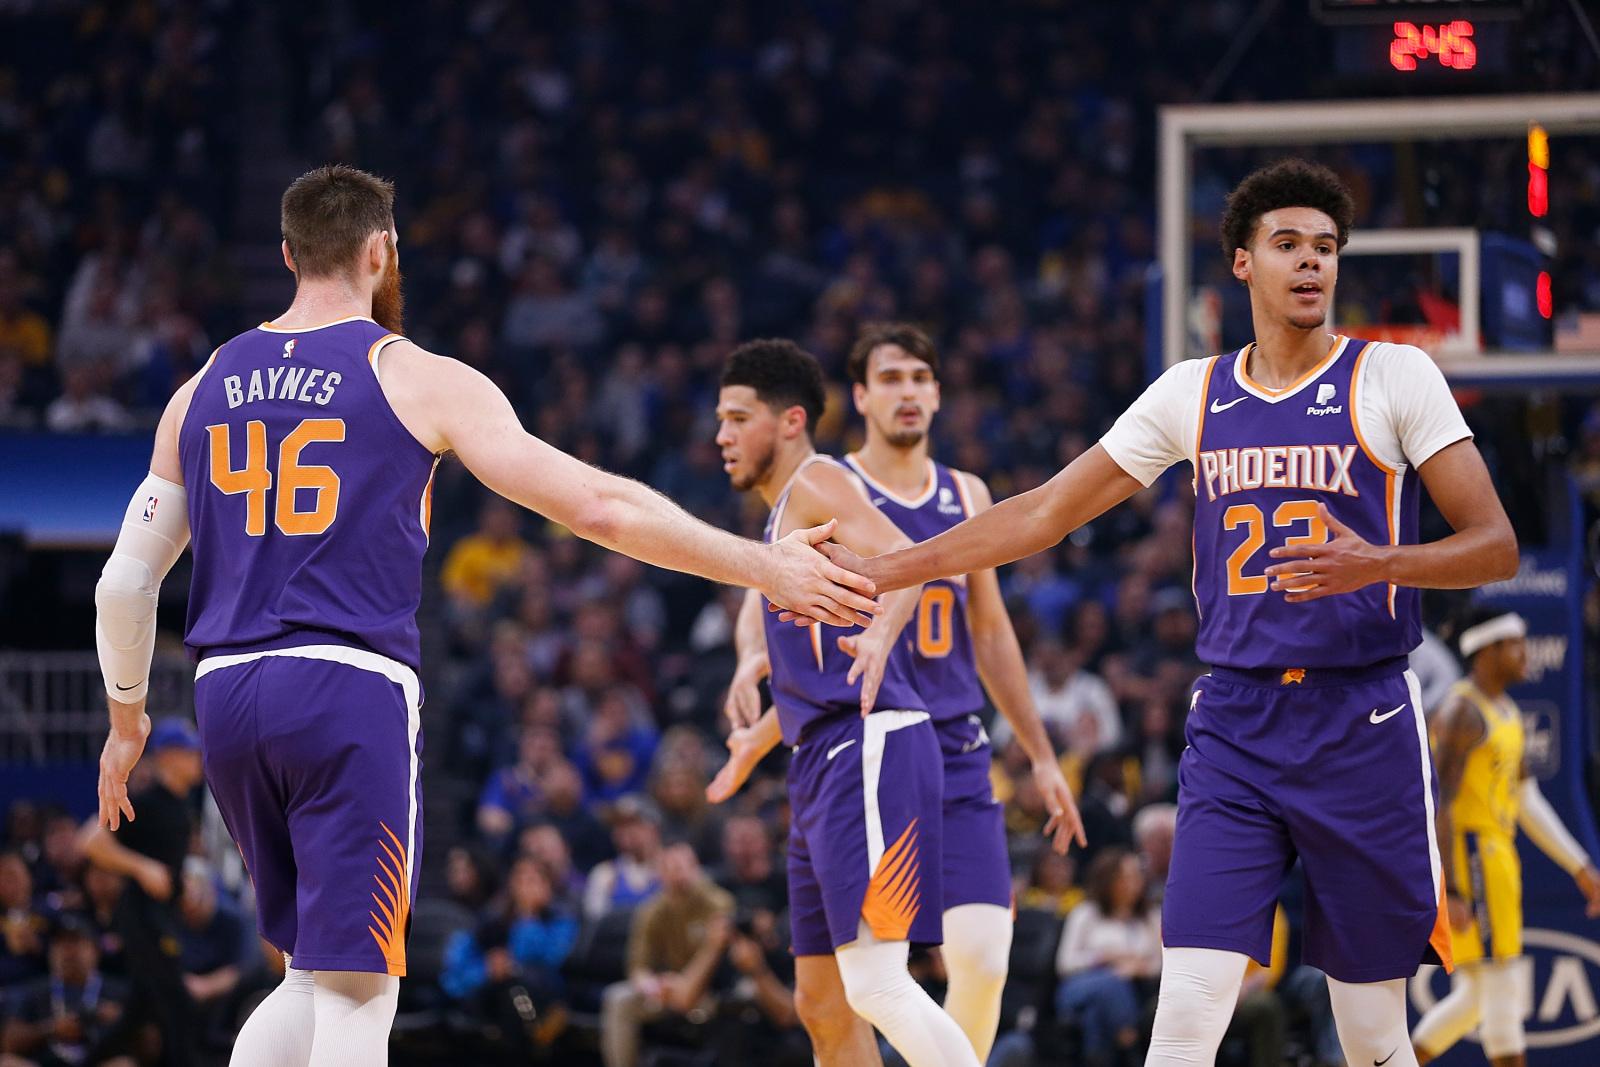 Complete fixtures of Phoenix Suns for season 2020-21